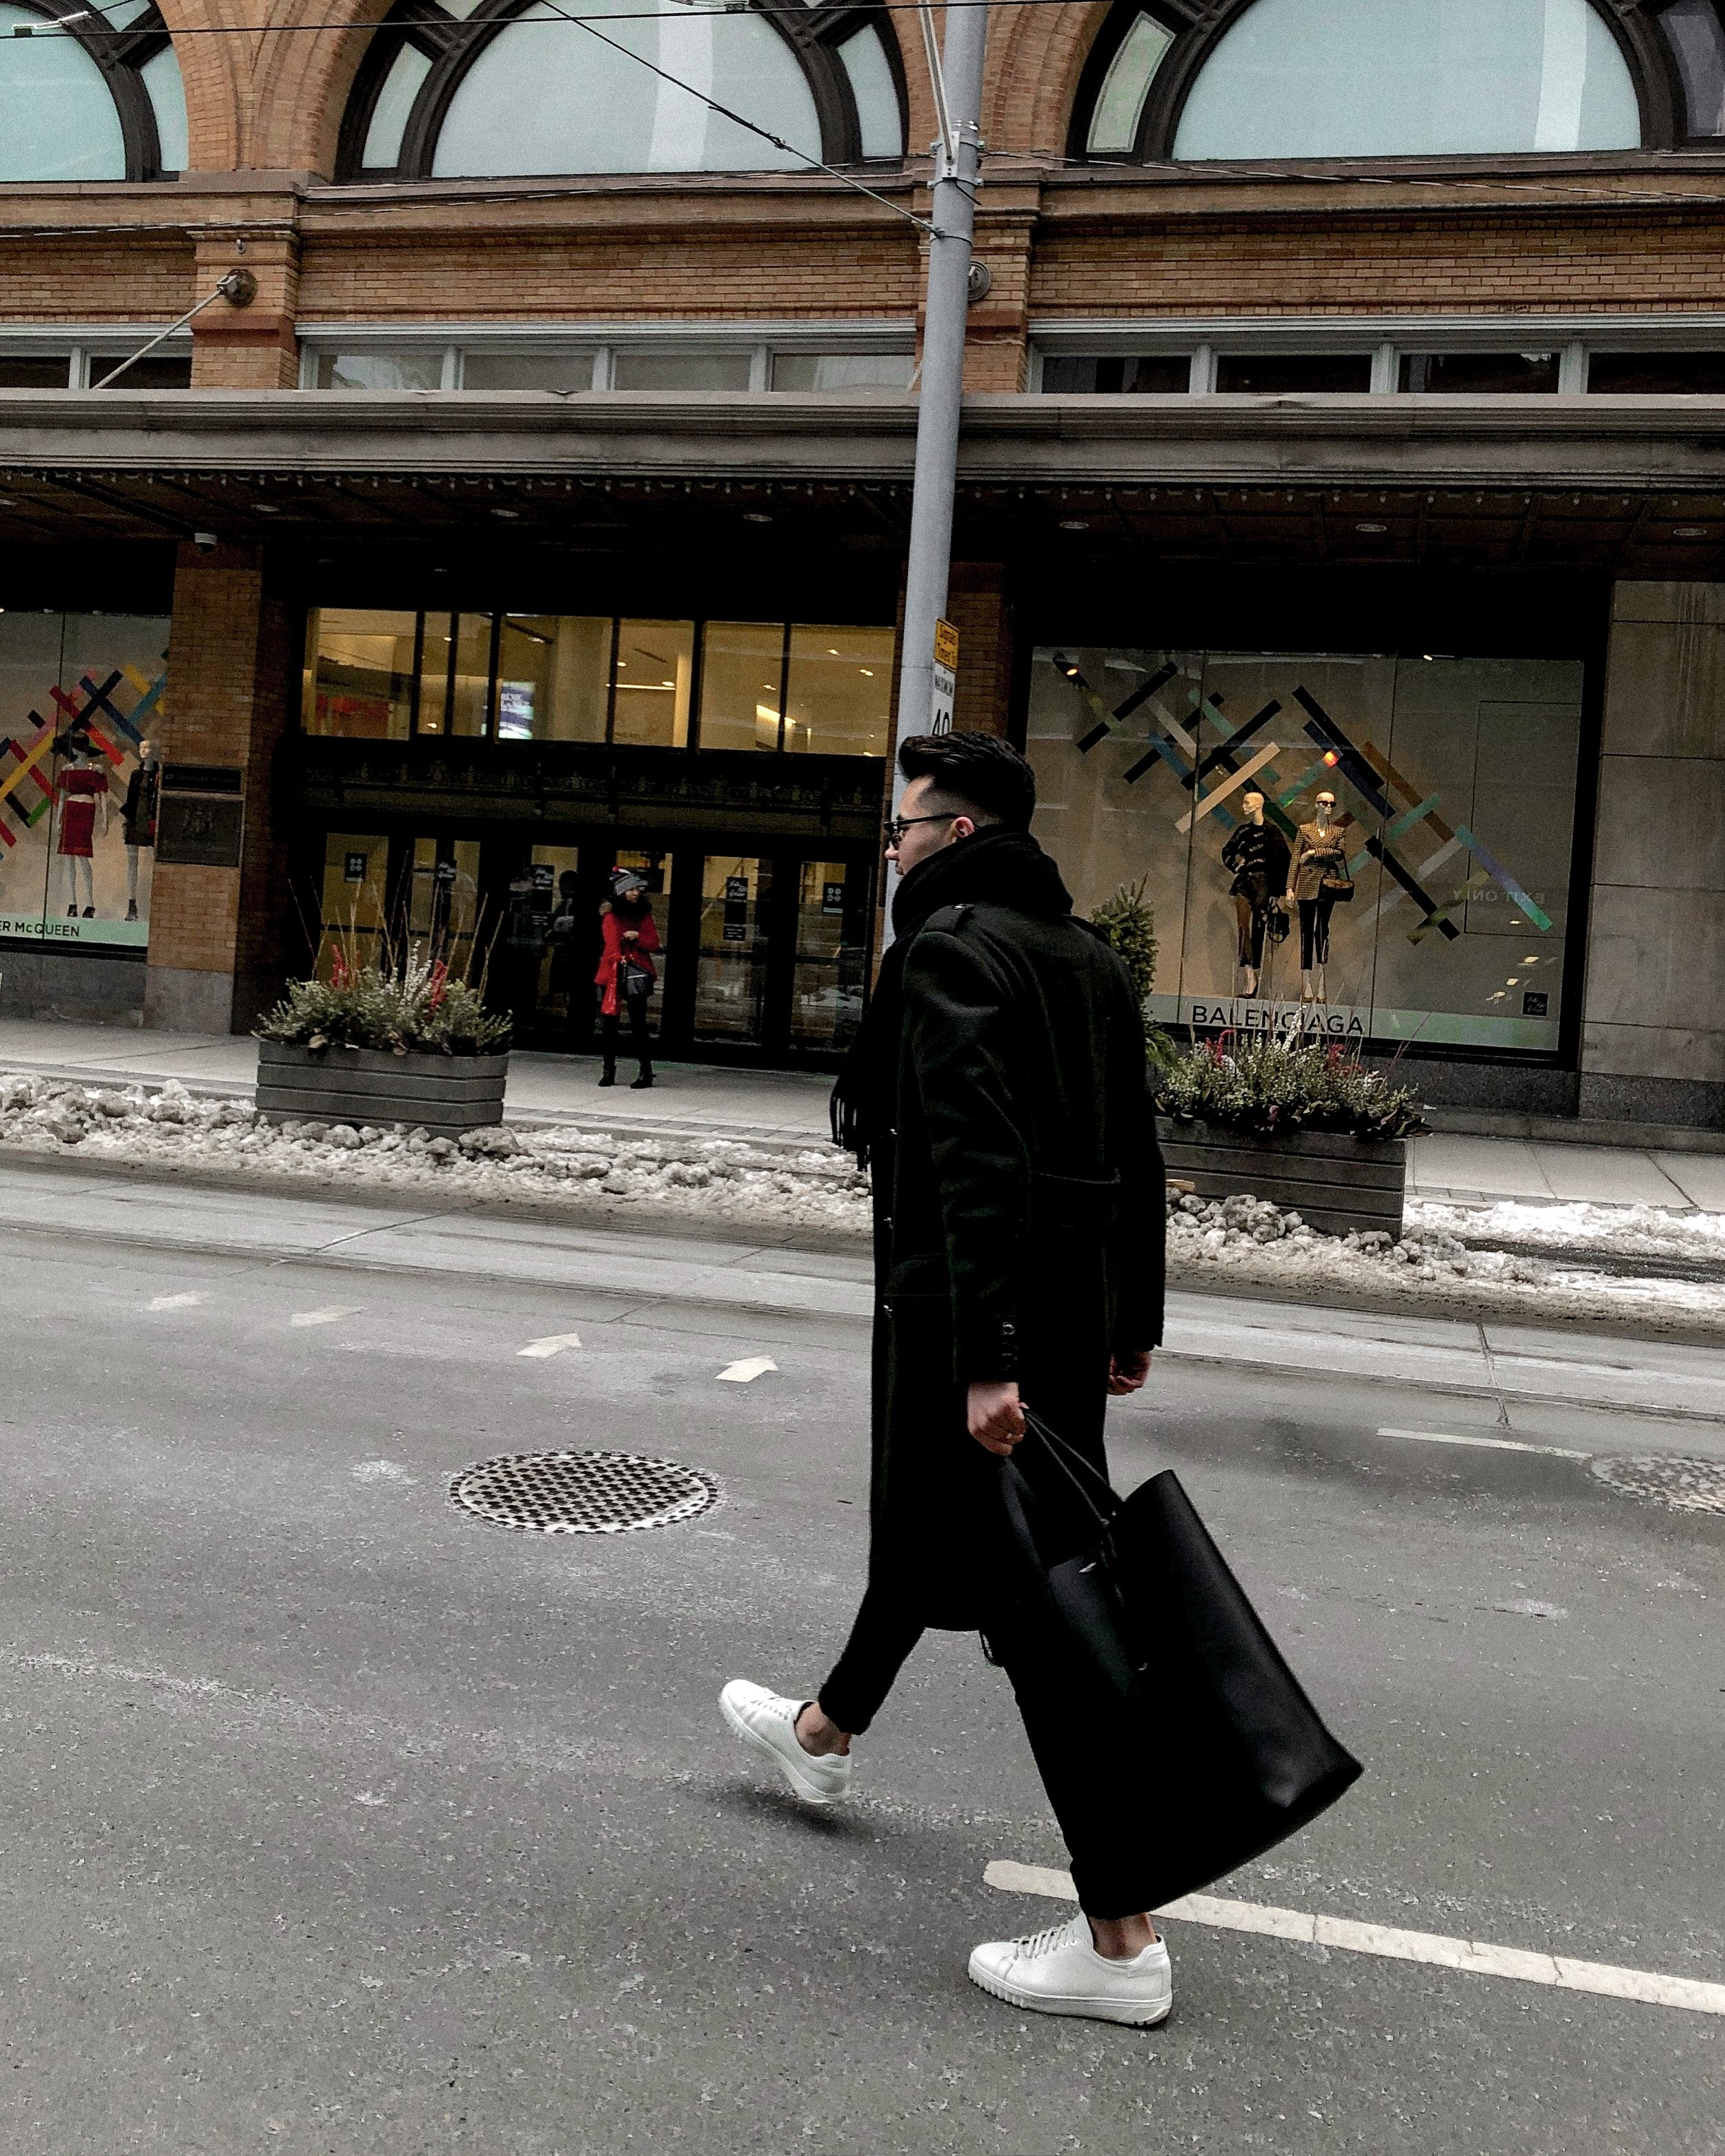 Michael Biro-Global Garçon-H&M-Zara-H&M oversized coat-Saint Laurent-Saint Laurent clutch-men's street style-globalgarcon.net